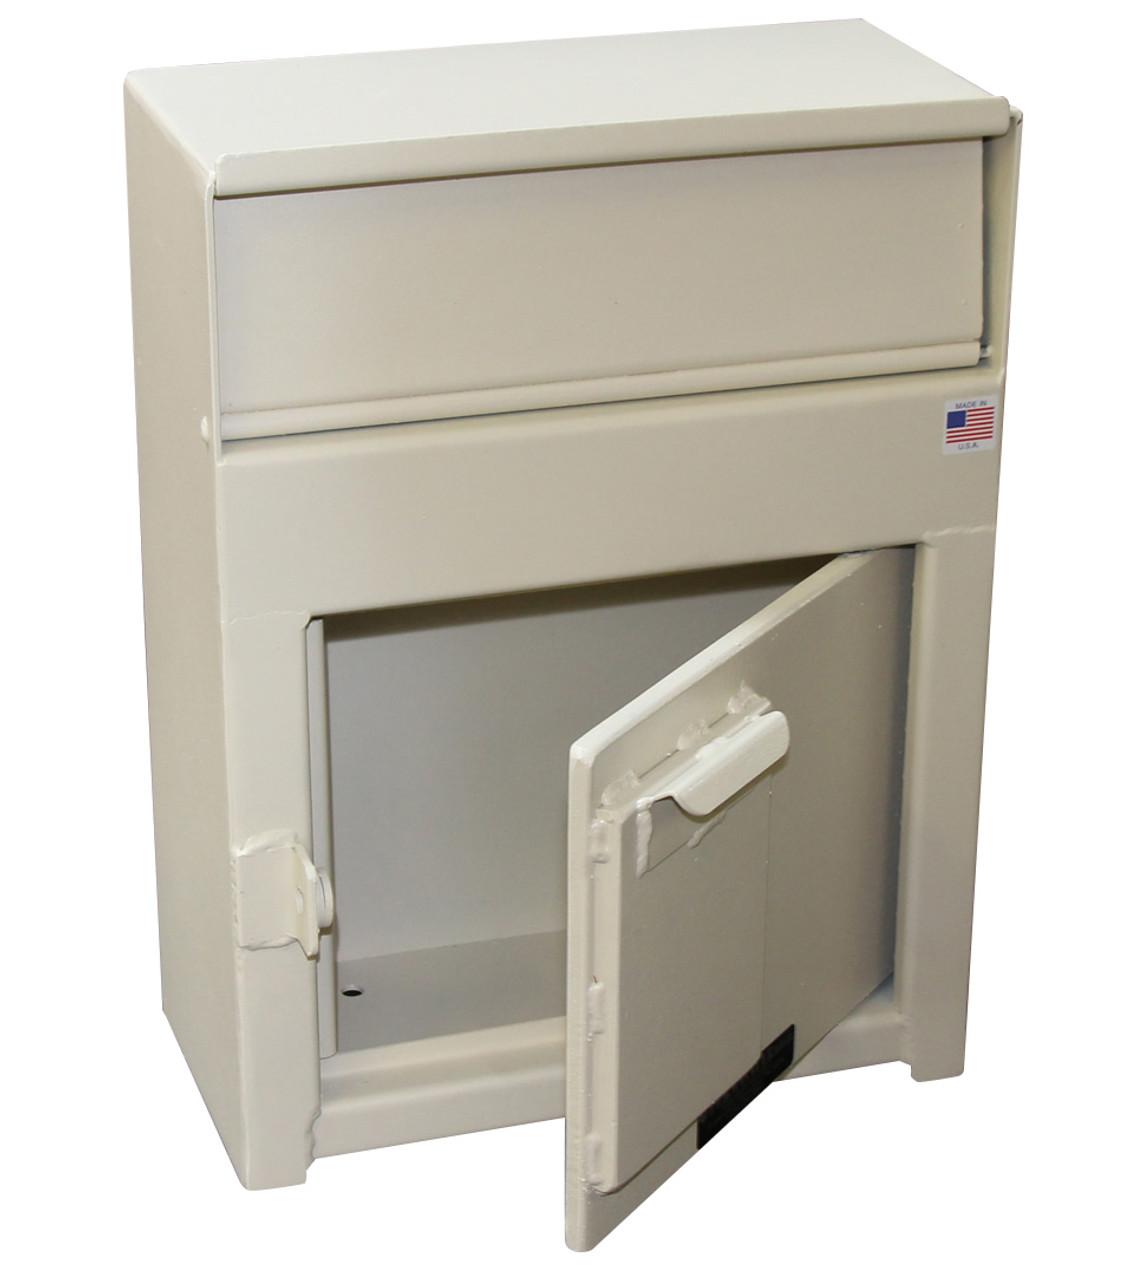 High Security Wall Mounted Payment Drop Box  door open